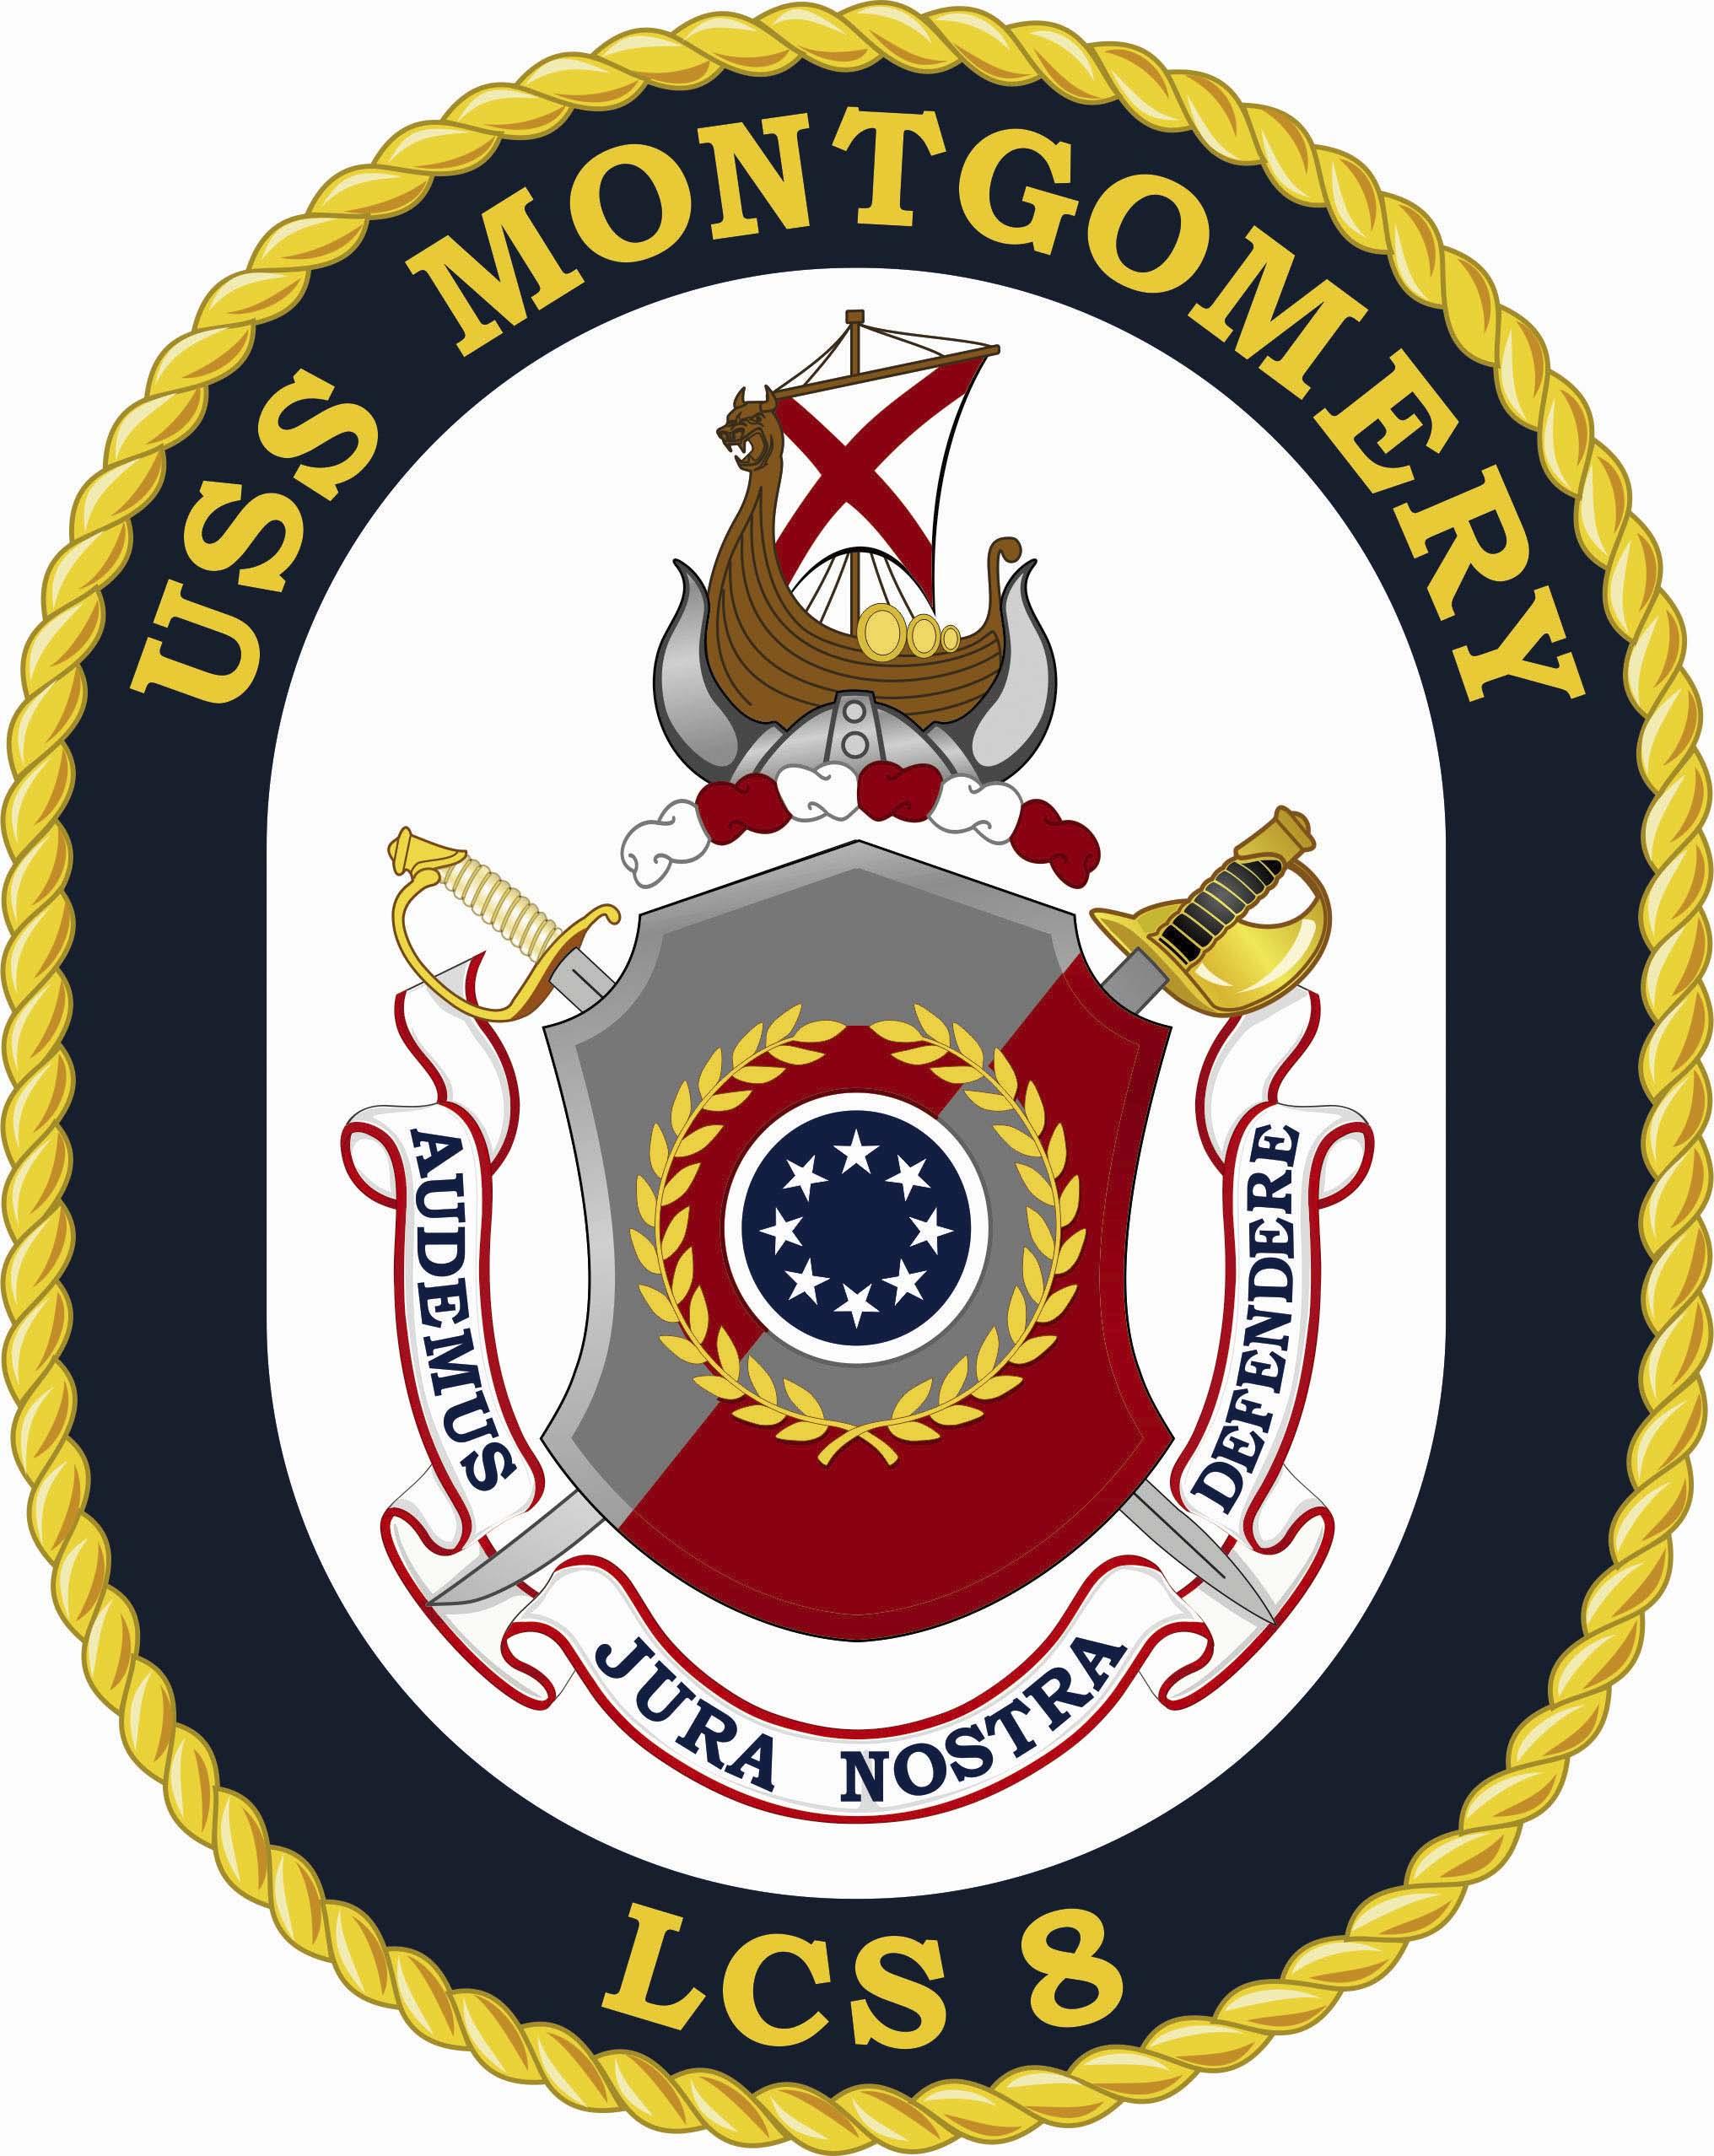 USS MONTGOMERY LCS-8 Crest Grafik: U.S. Navy